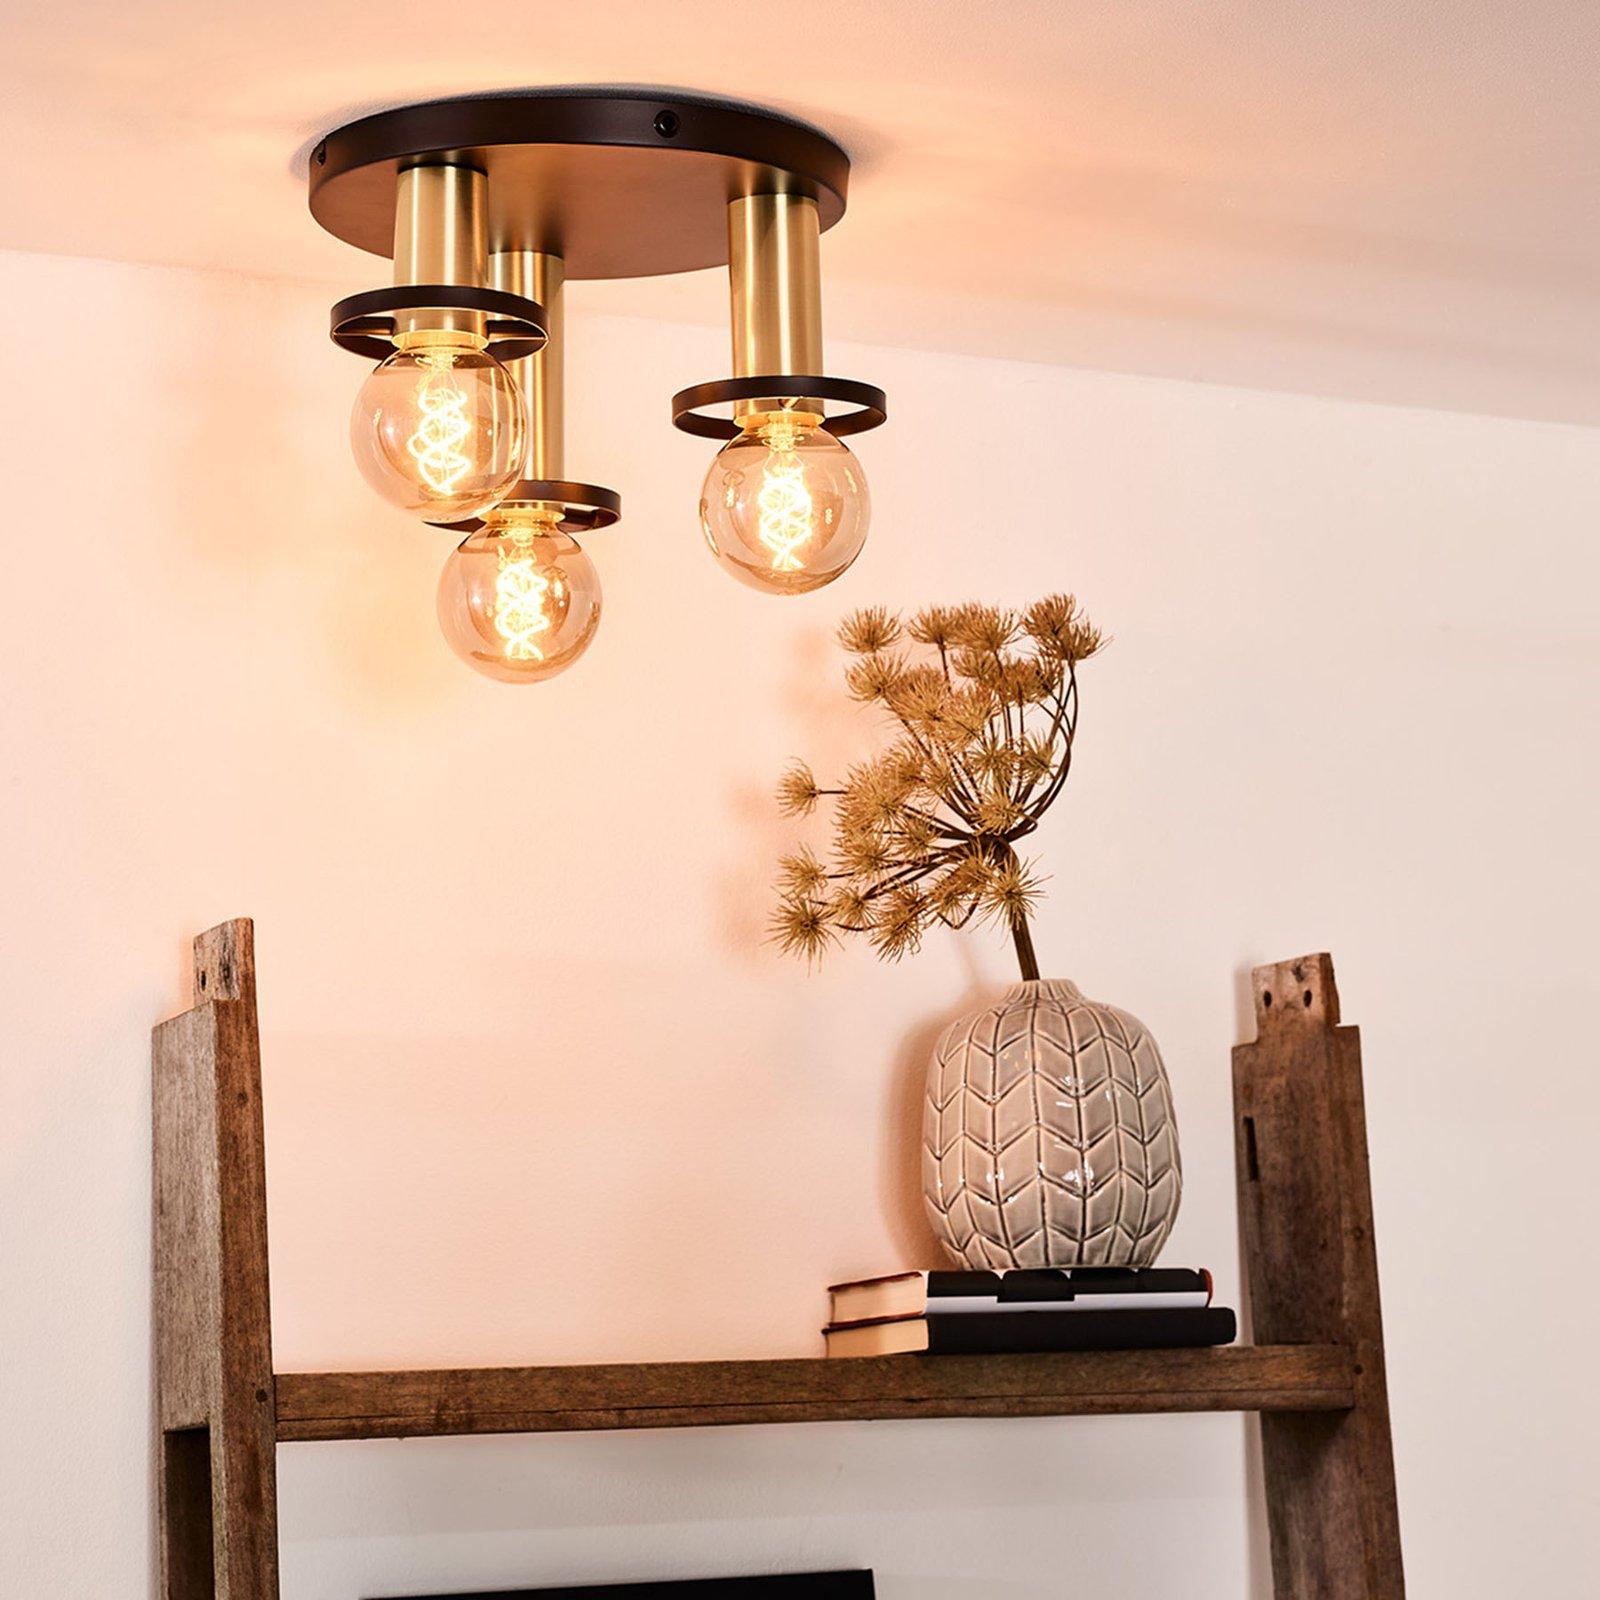 Anaka sirkelformet taklampe, 3 lyskilder